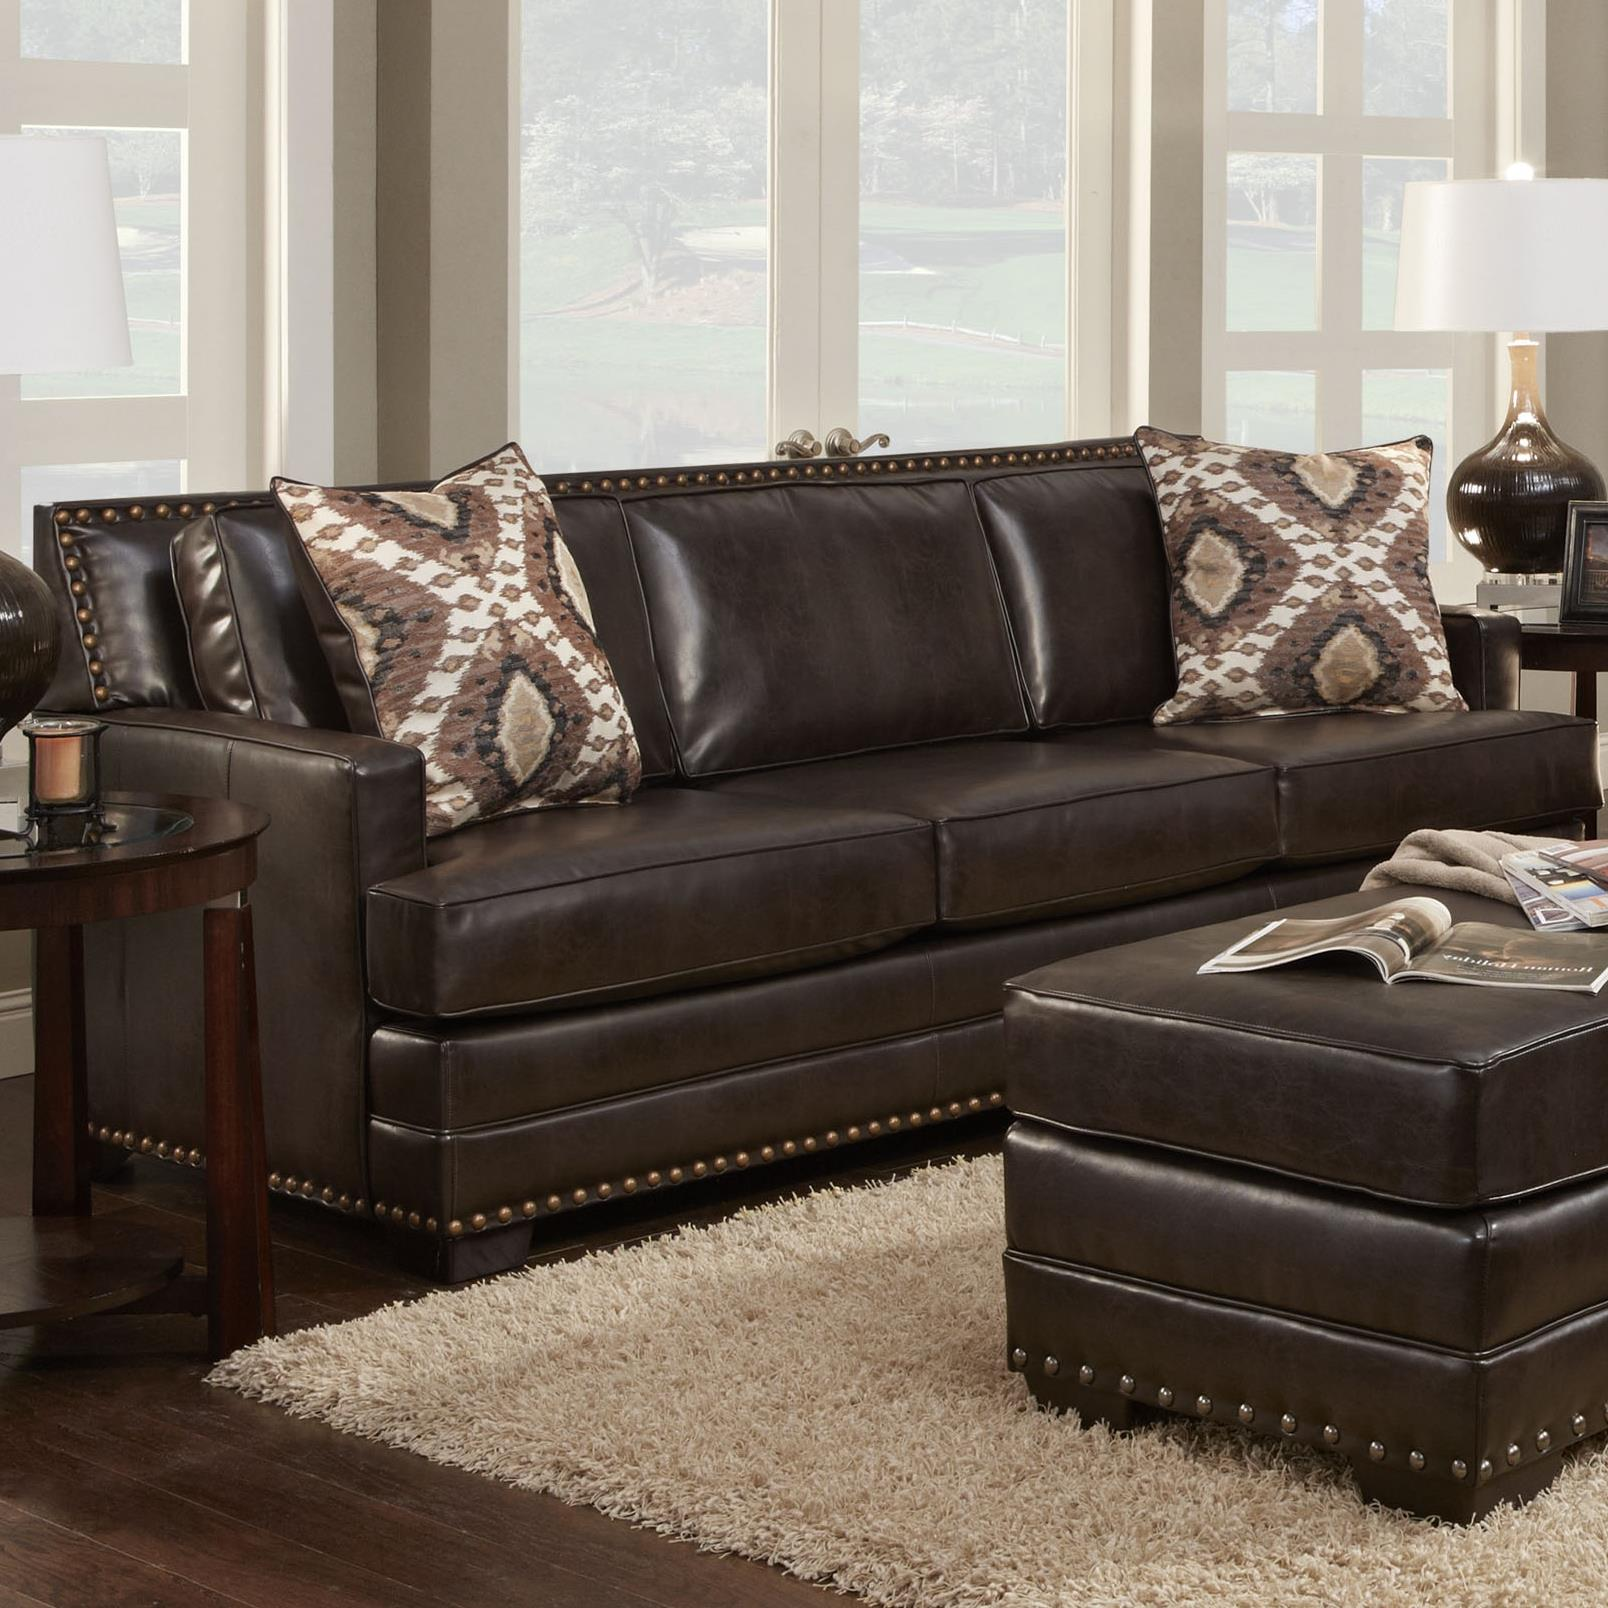 Washington Furniture 1720 1723 692 Transitional Sofa Household Furniture Sofa